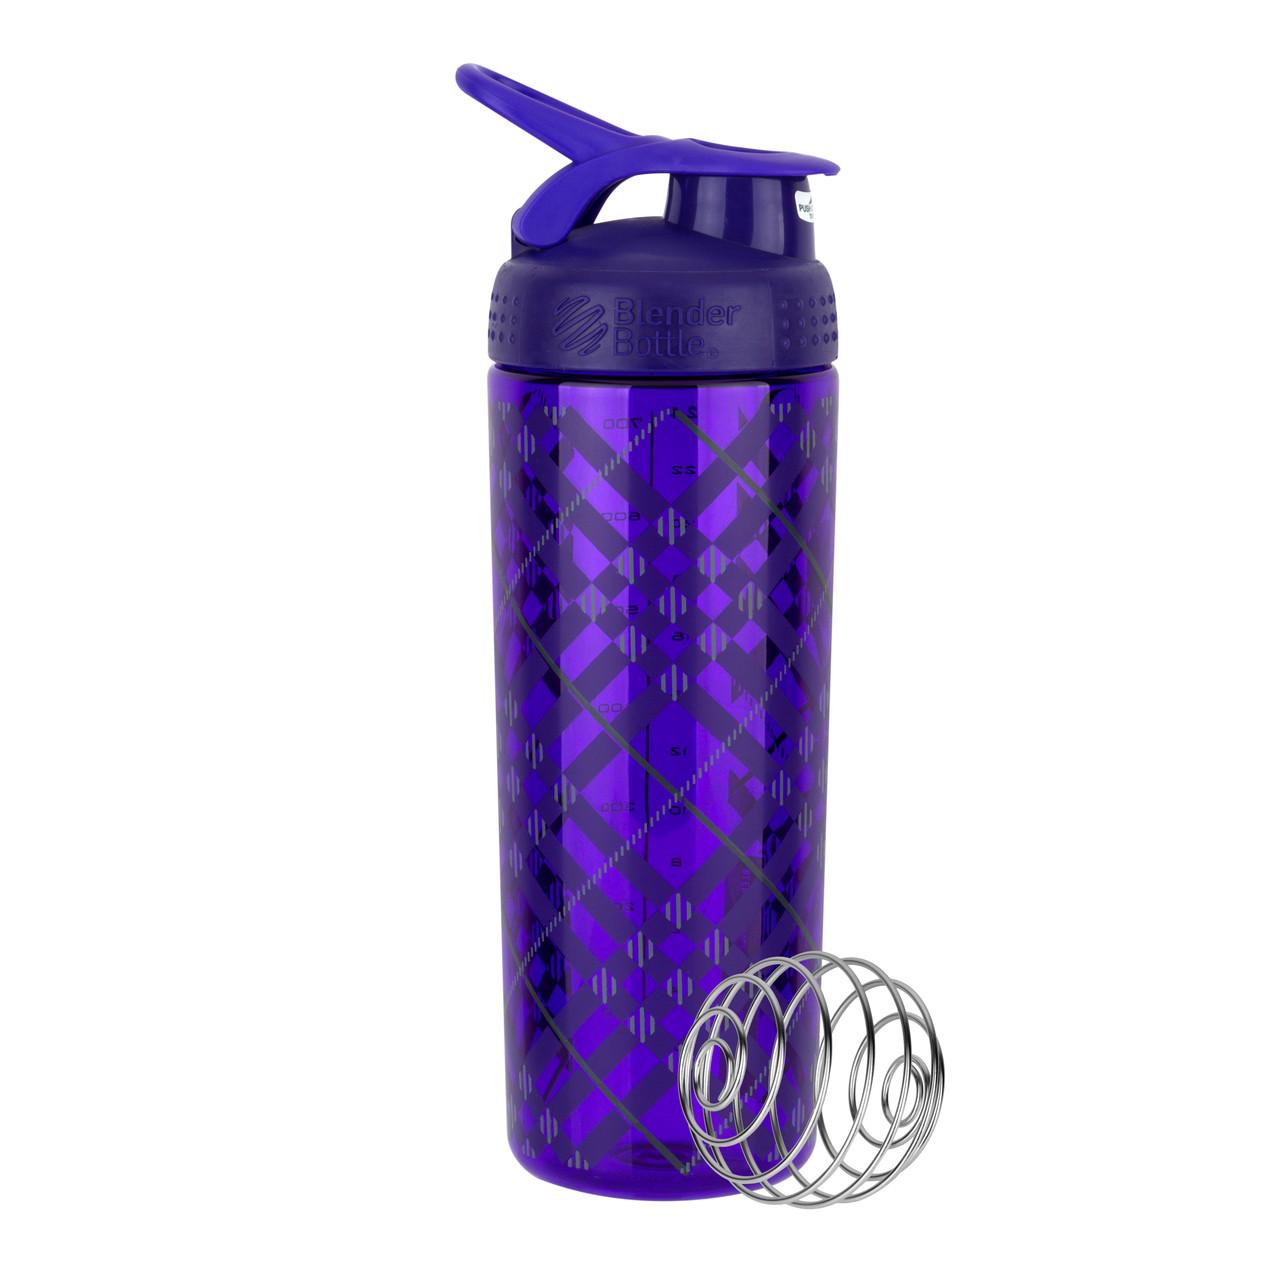 Спортивная бутылка-шейкер BlenderBottle SportMixer Signature Sleek PURPLE TRATAN PLAID 820мл (ORIGINAL)